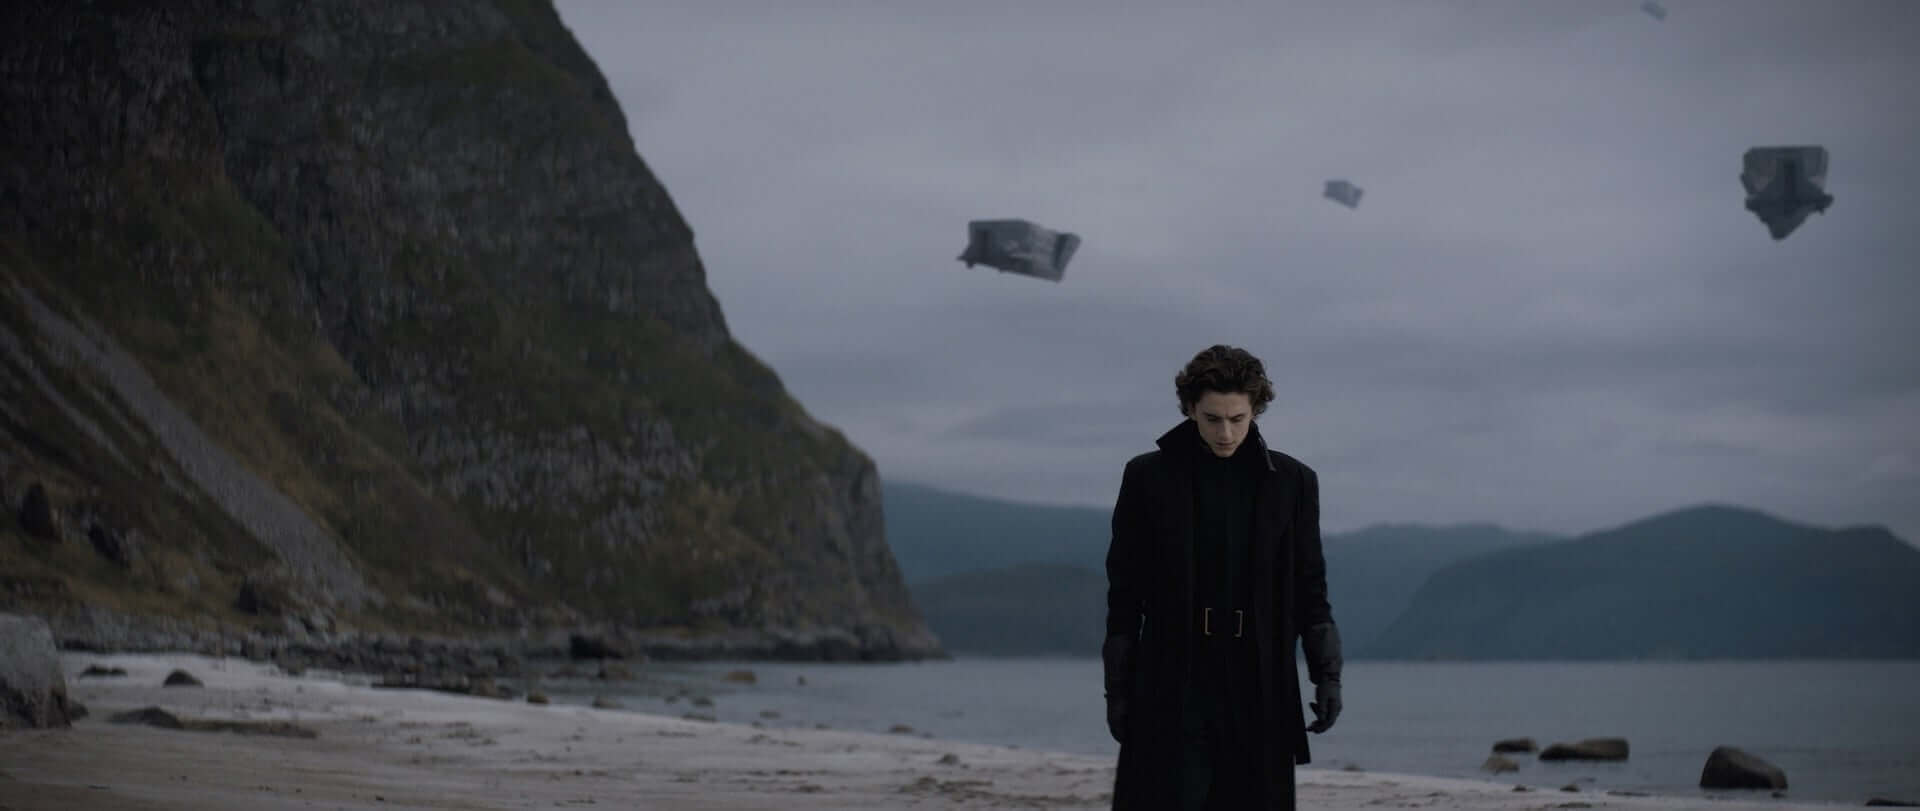 『DUNE/デューン 砂の惑星』の日本公開日がついに決定!ティモシー・シャラメが躍動する日本版特報も解禁 film210707_dune_2